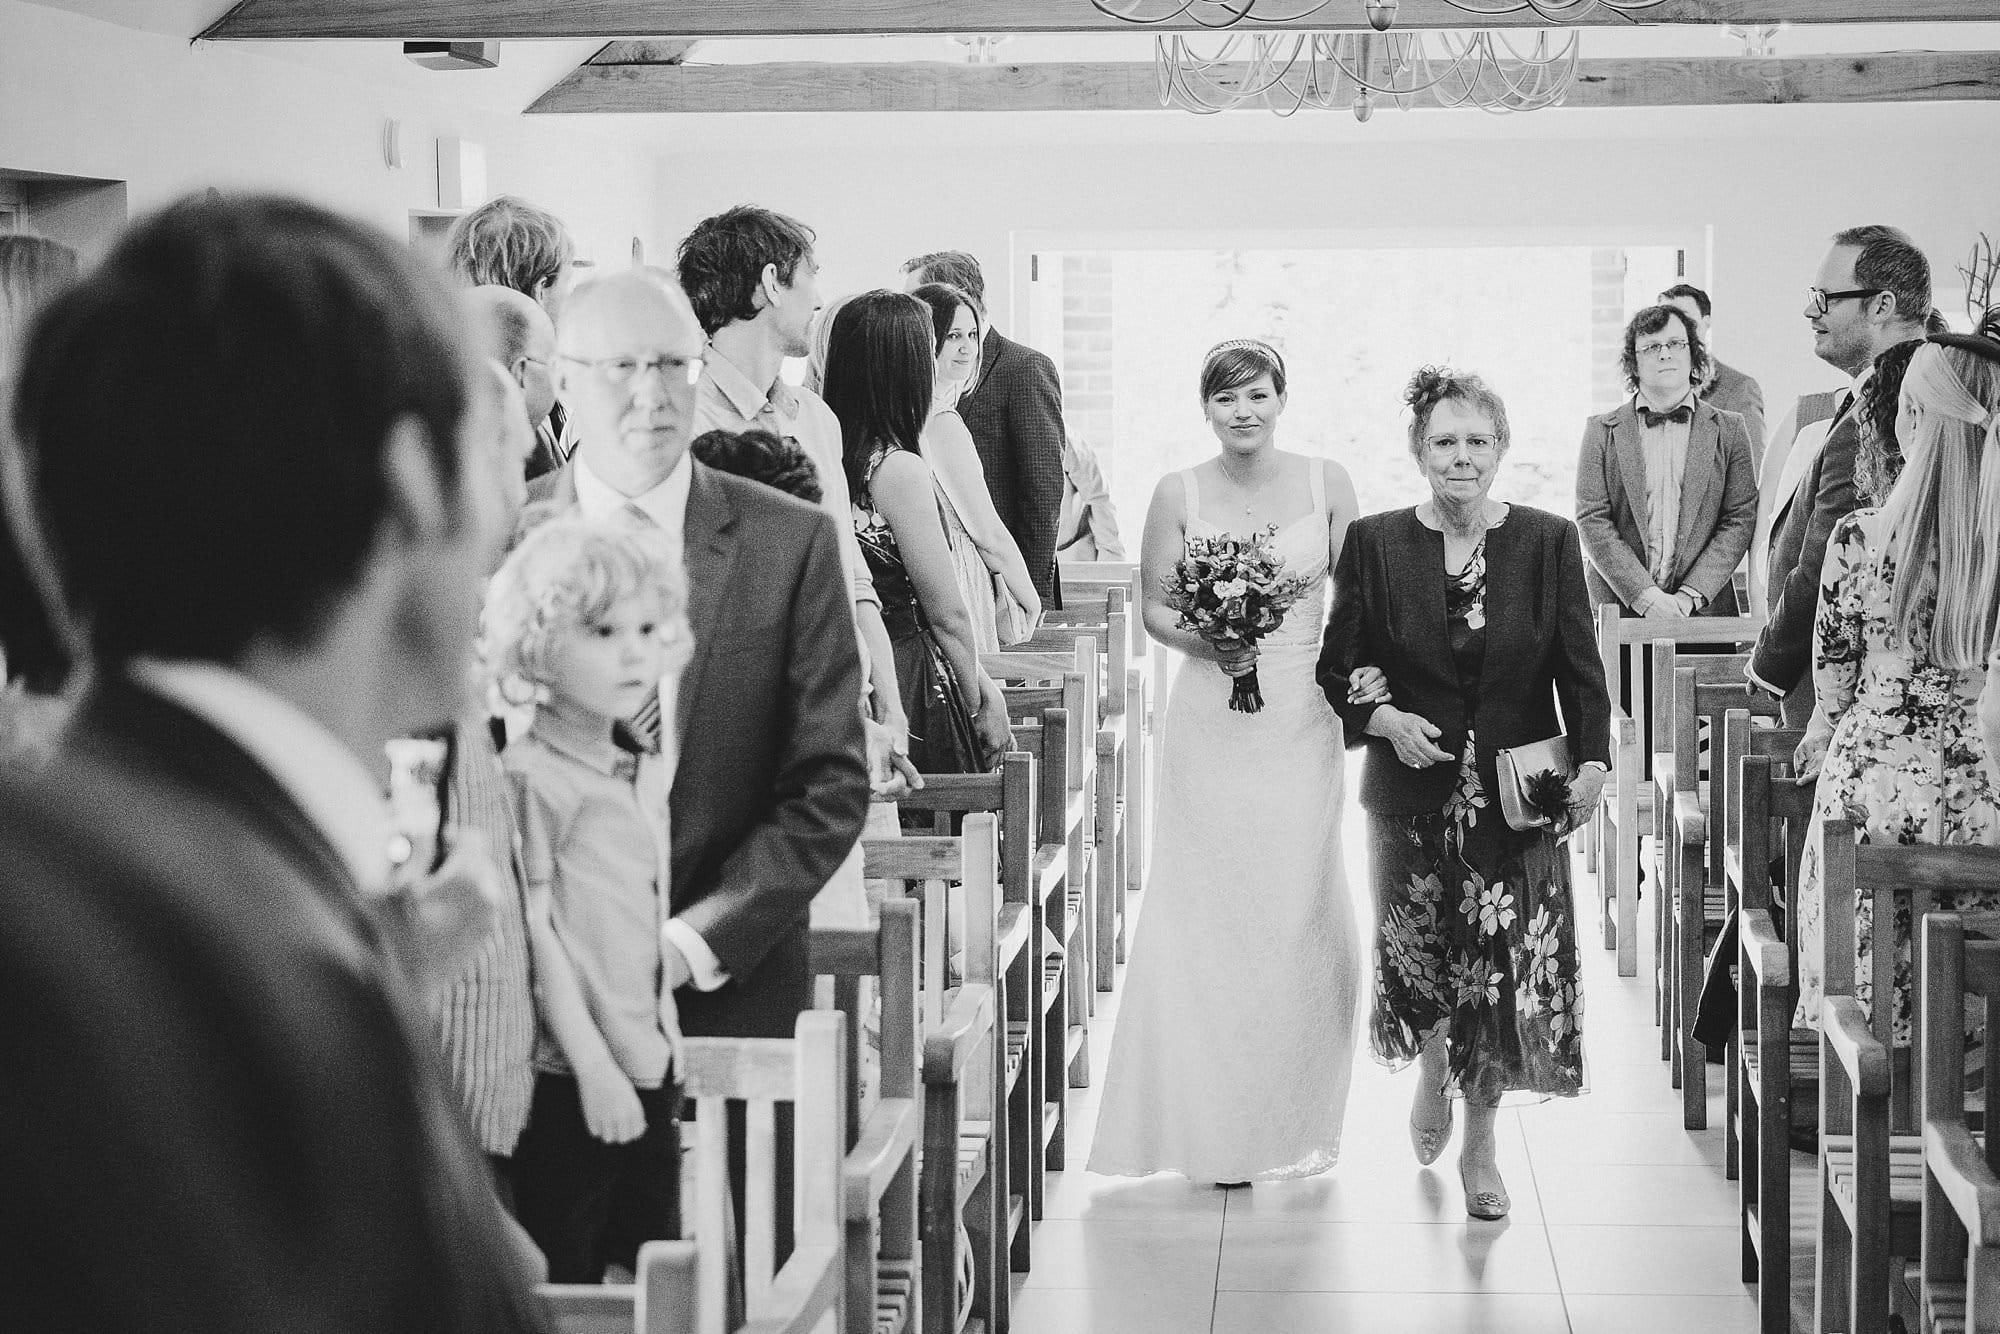 oaks farm wedding photographer cj 038 - Cat + Jake   Oaks Farm Wedding Photography